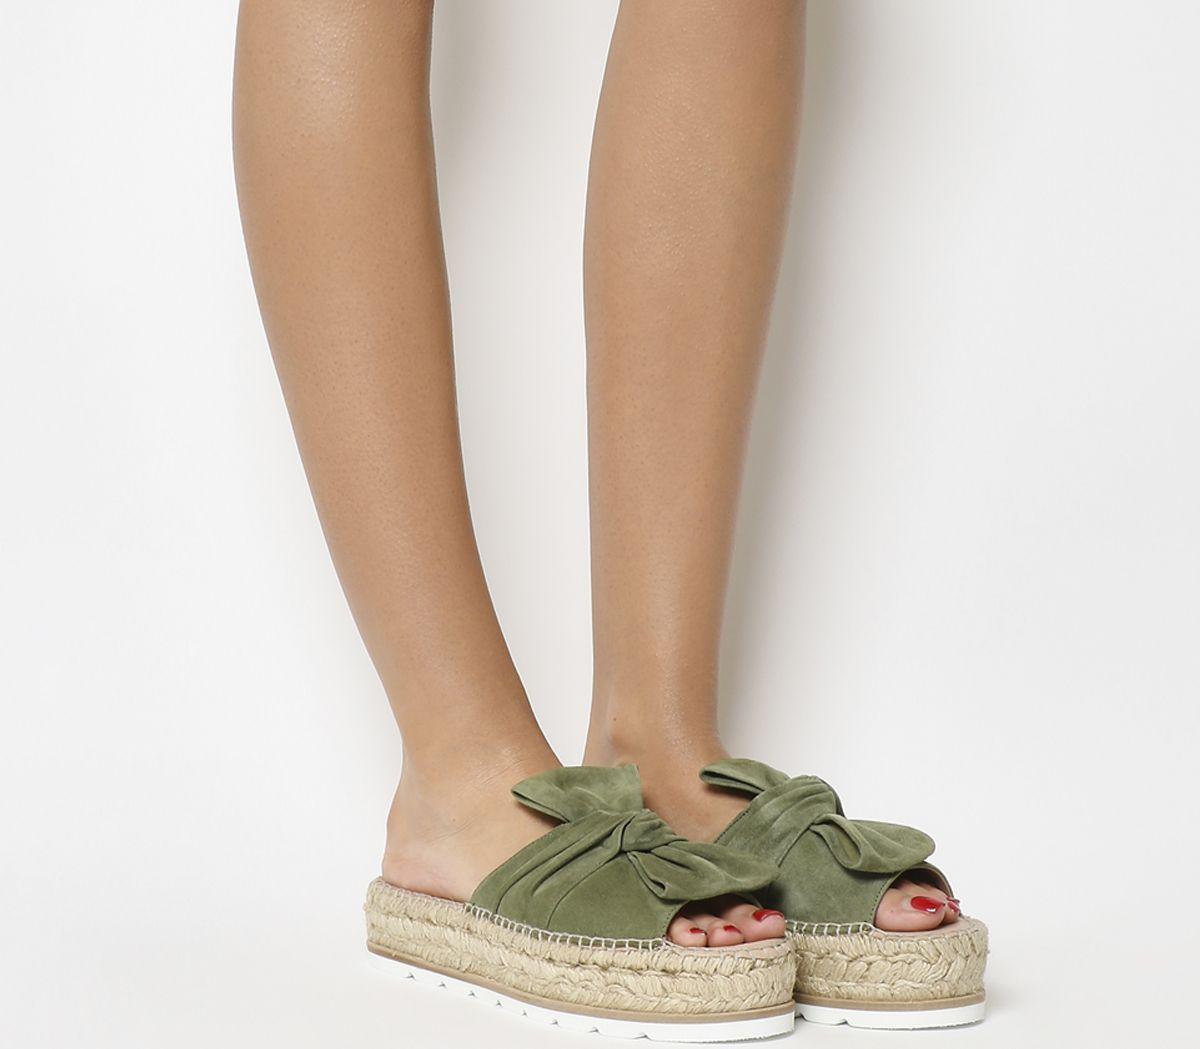 ab7bd1010adc Gaimo for OFFICE Samanta Bow Flatform Sandals Khaki Suede - Mid Heels